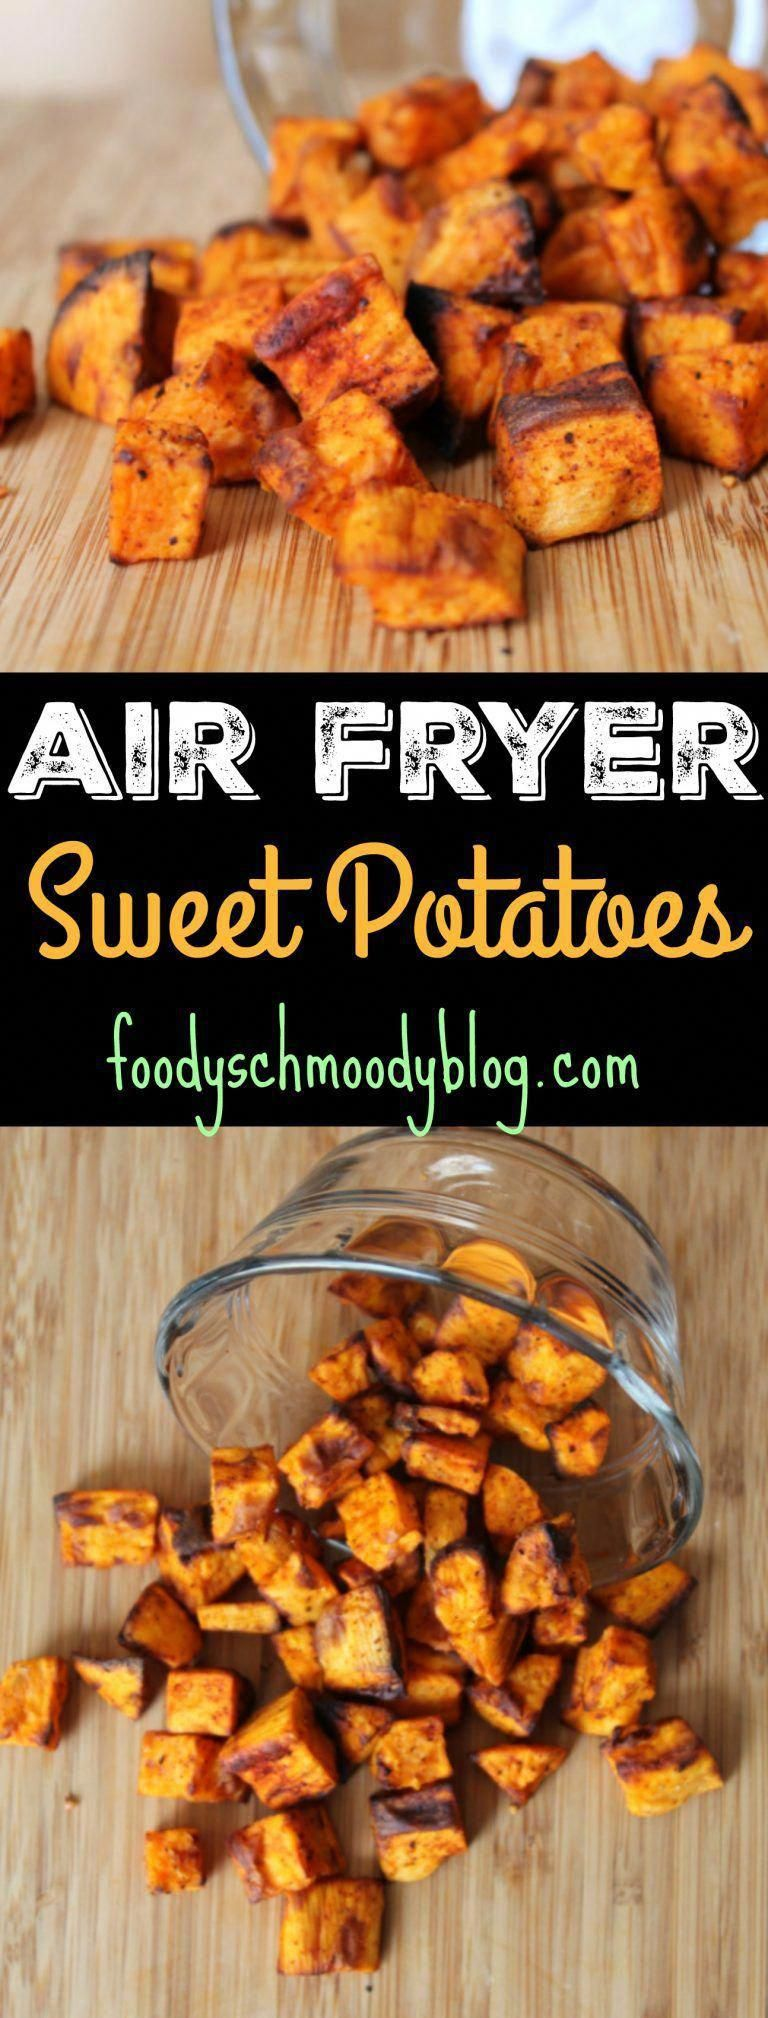 Air Fryer Sweet Potatoes Recipe Air fryer recipes